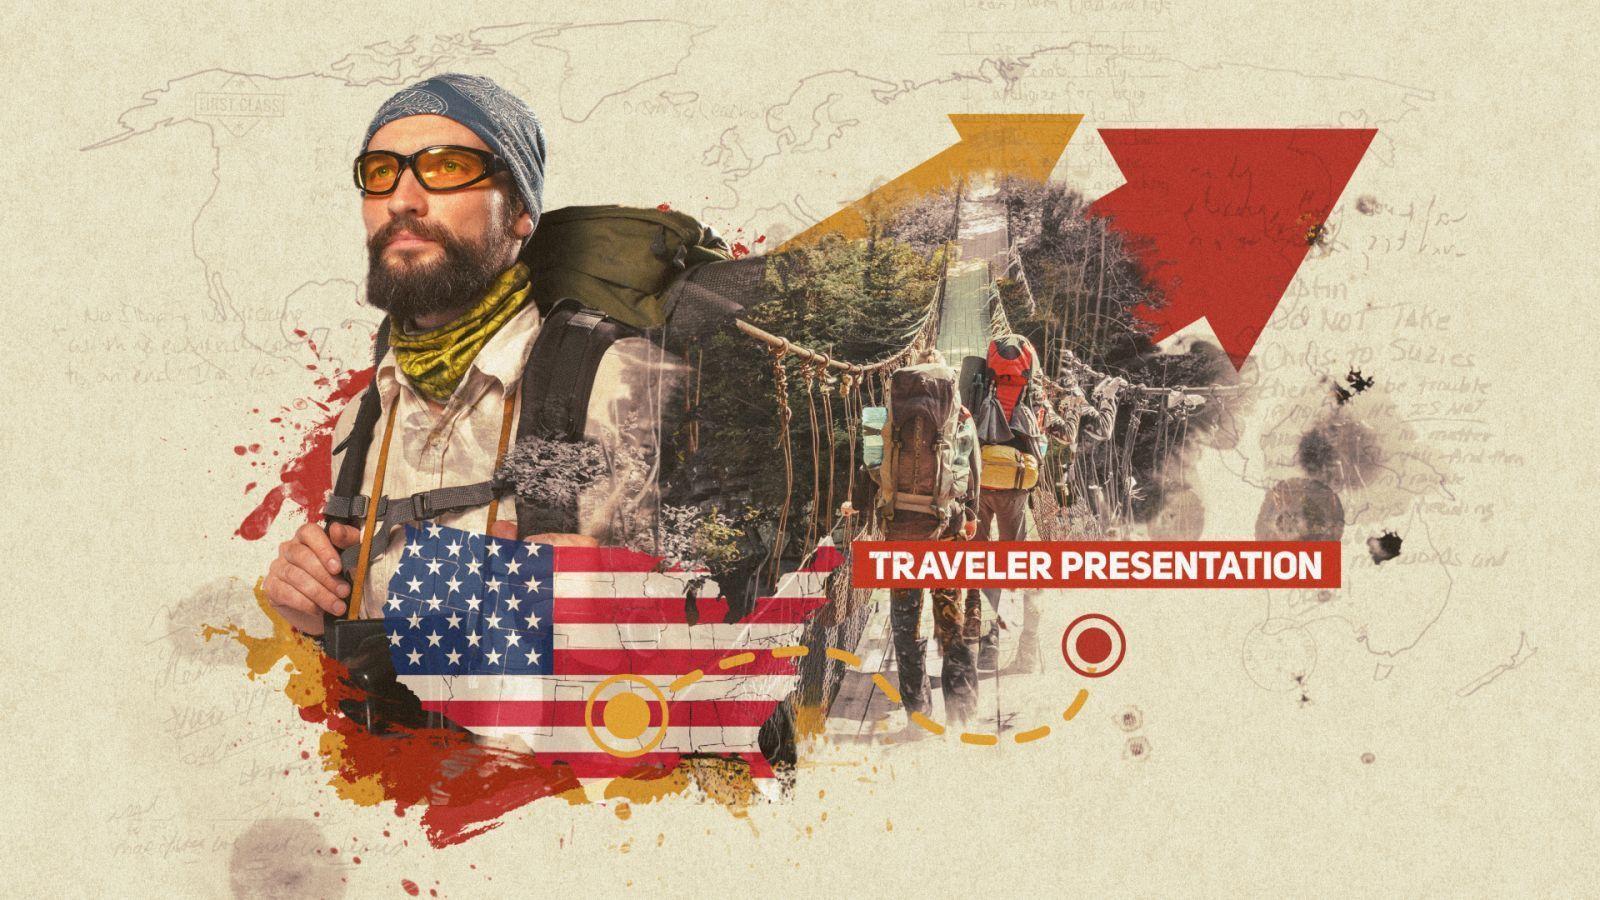 Traveler Presentation